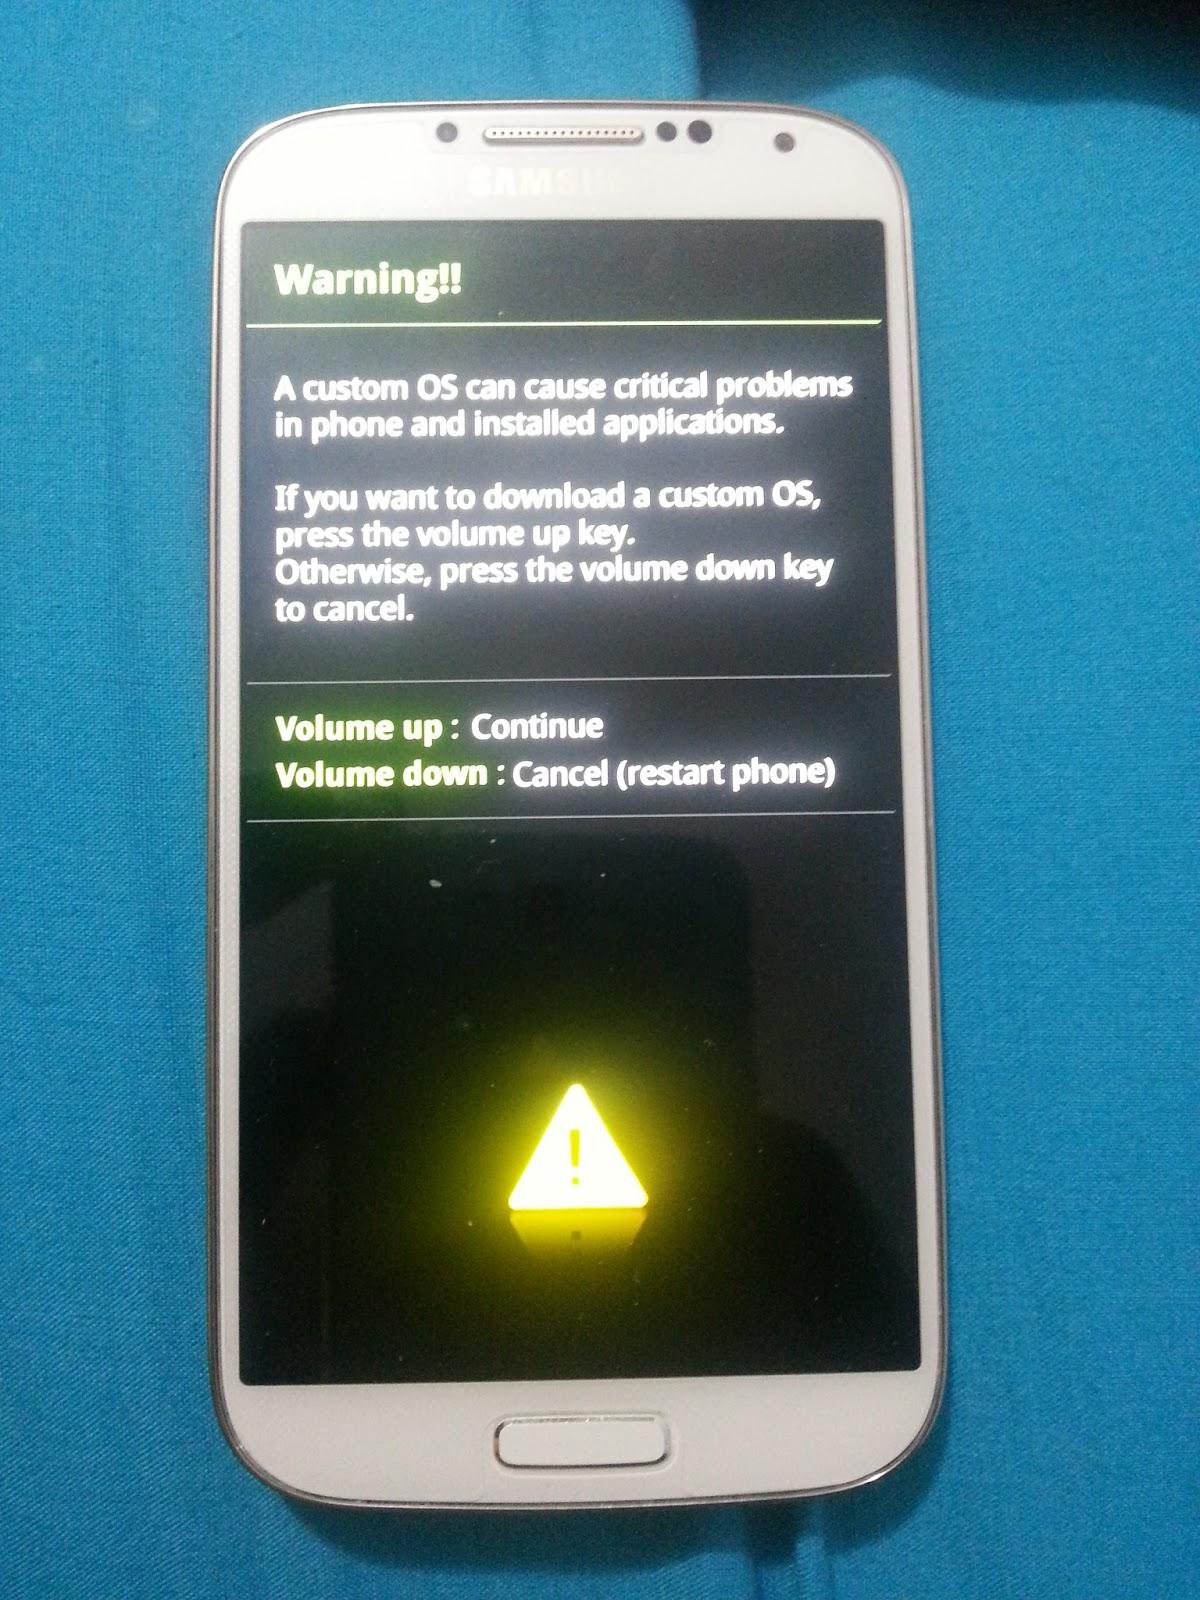 How To Overclock Samsung Galaxy S4 I9505/I9500, Note 2, S3